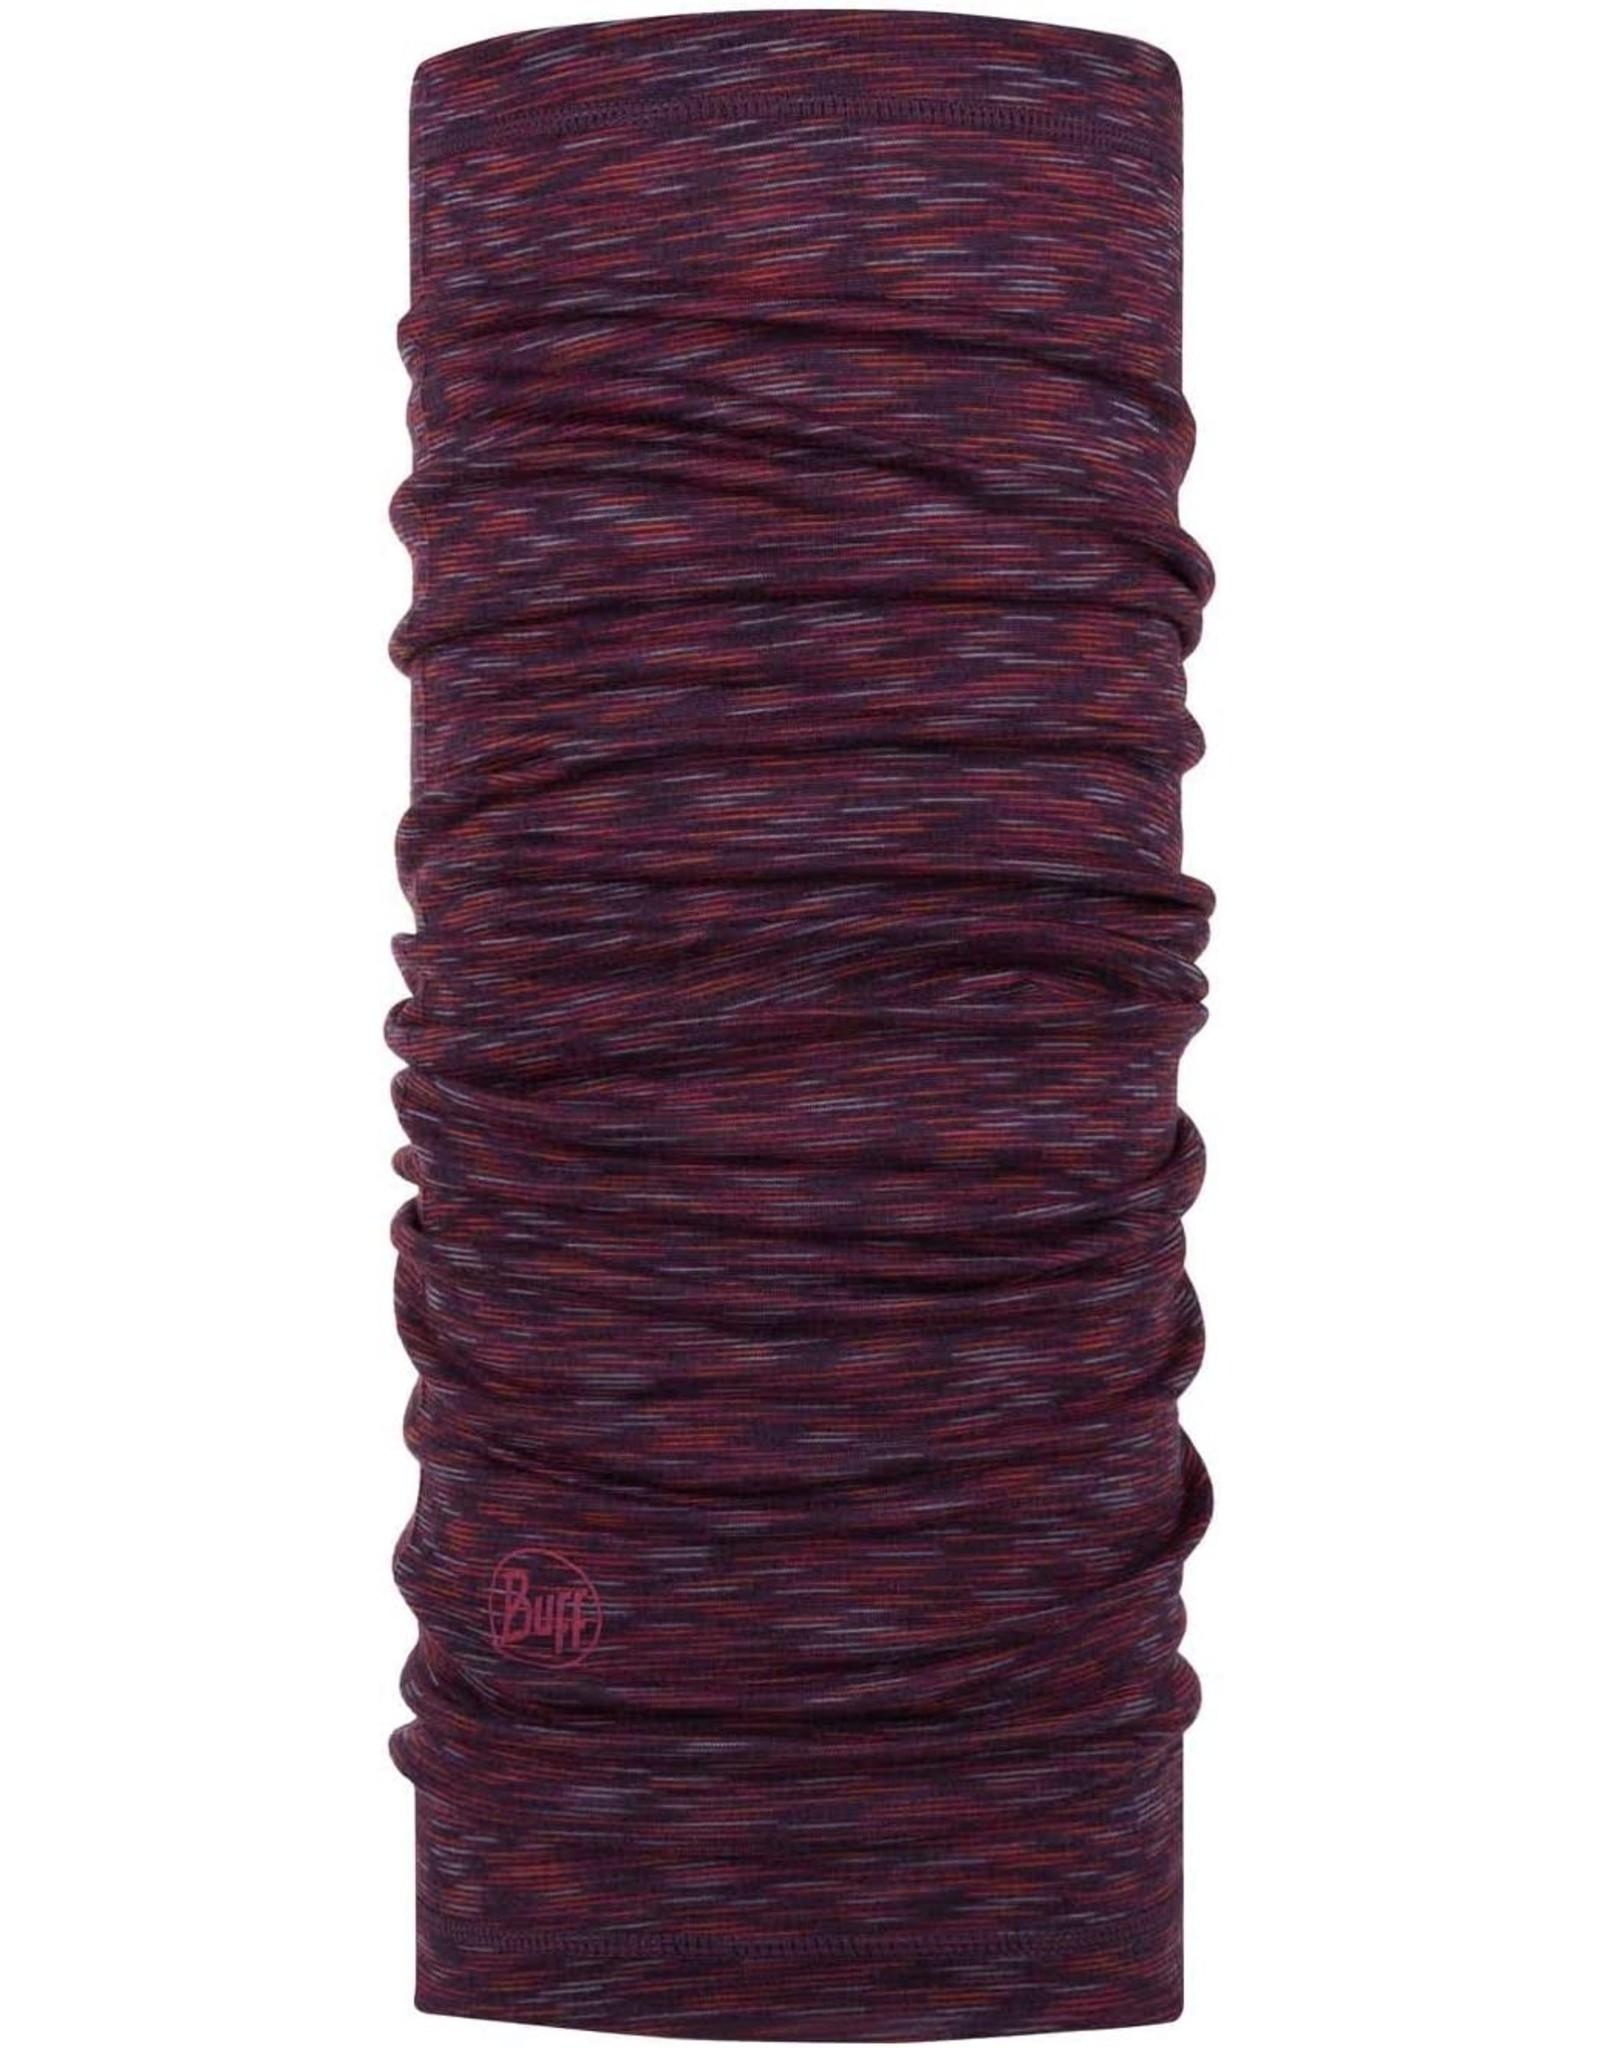 Buff Buff - Lightweight Merino Wool